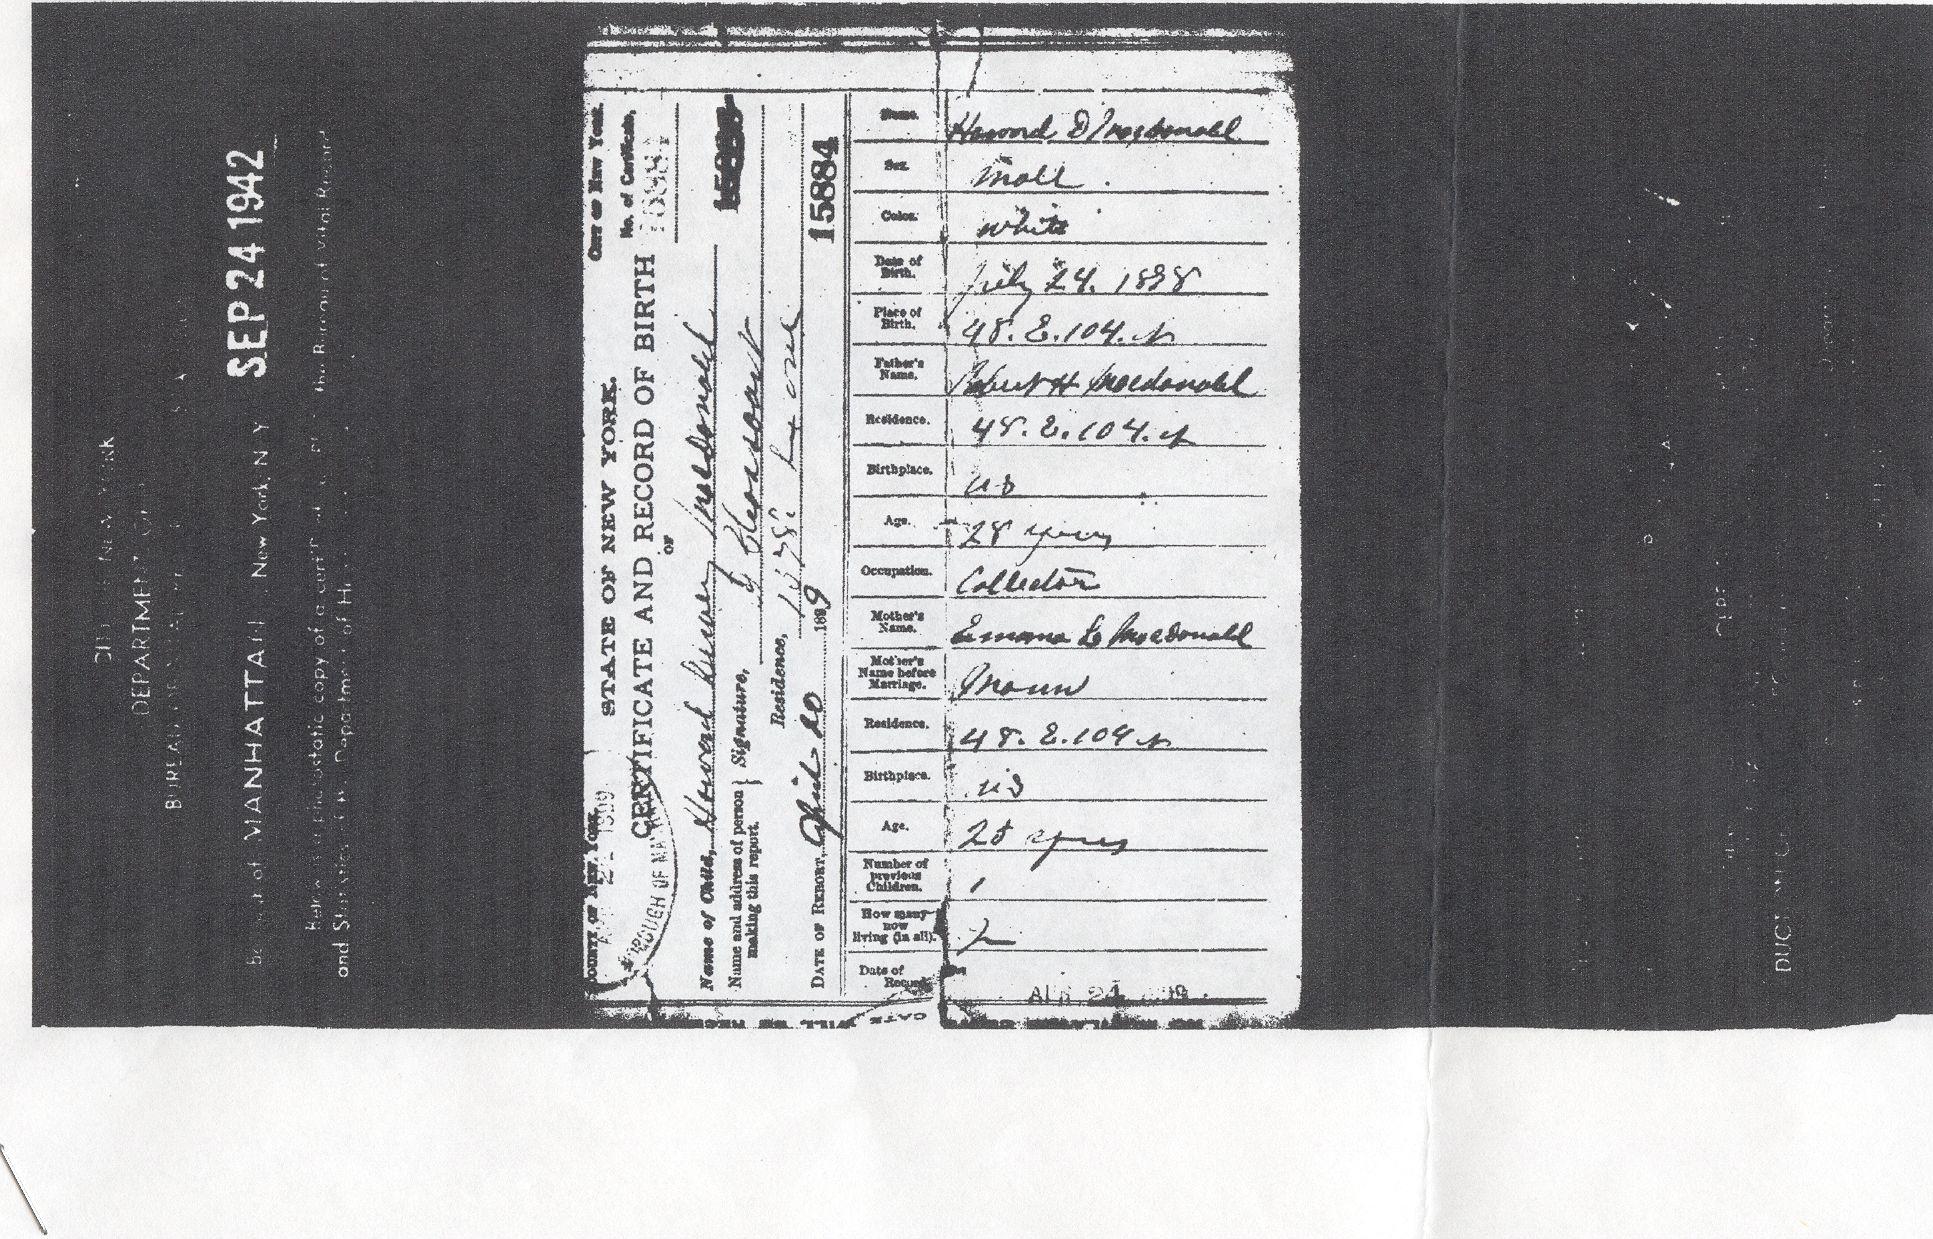 Howard dewey macdonald birth certificate 1898 manhattan ny howard dewey macdonald birth certificate 1898 manhattan ny aiddatafo Image collections